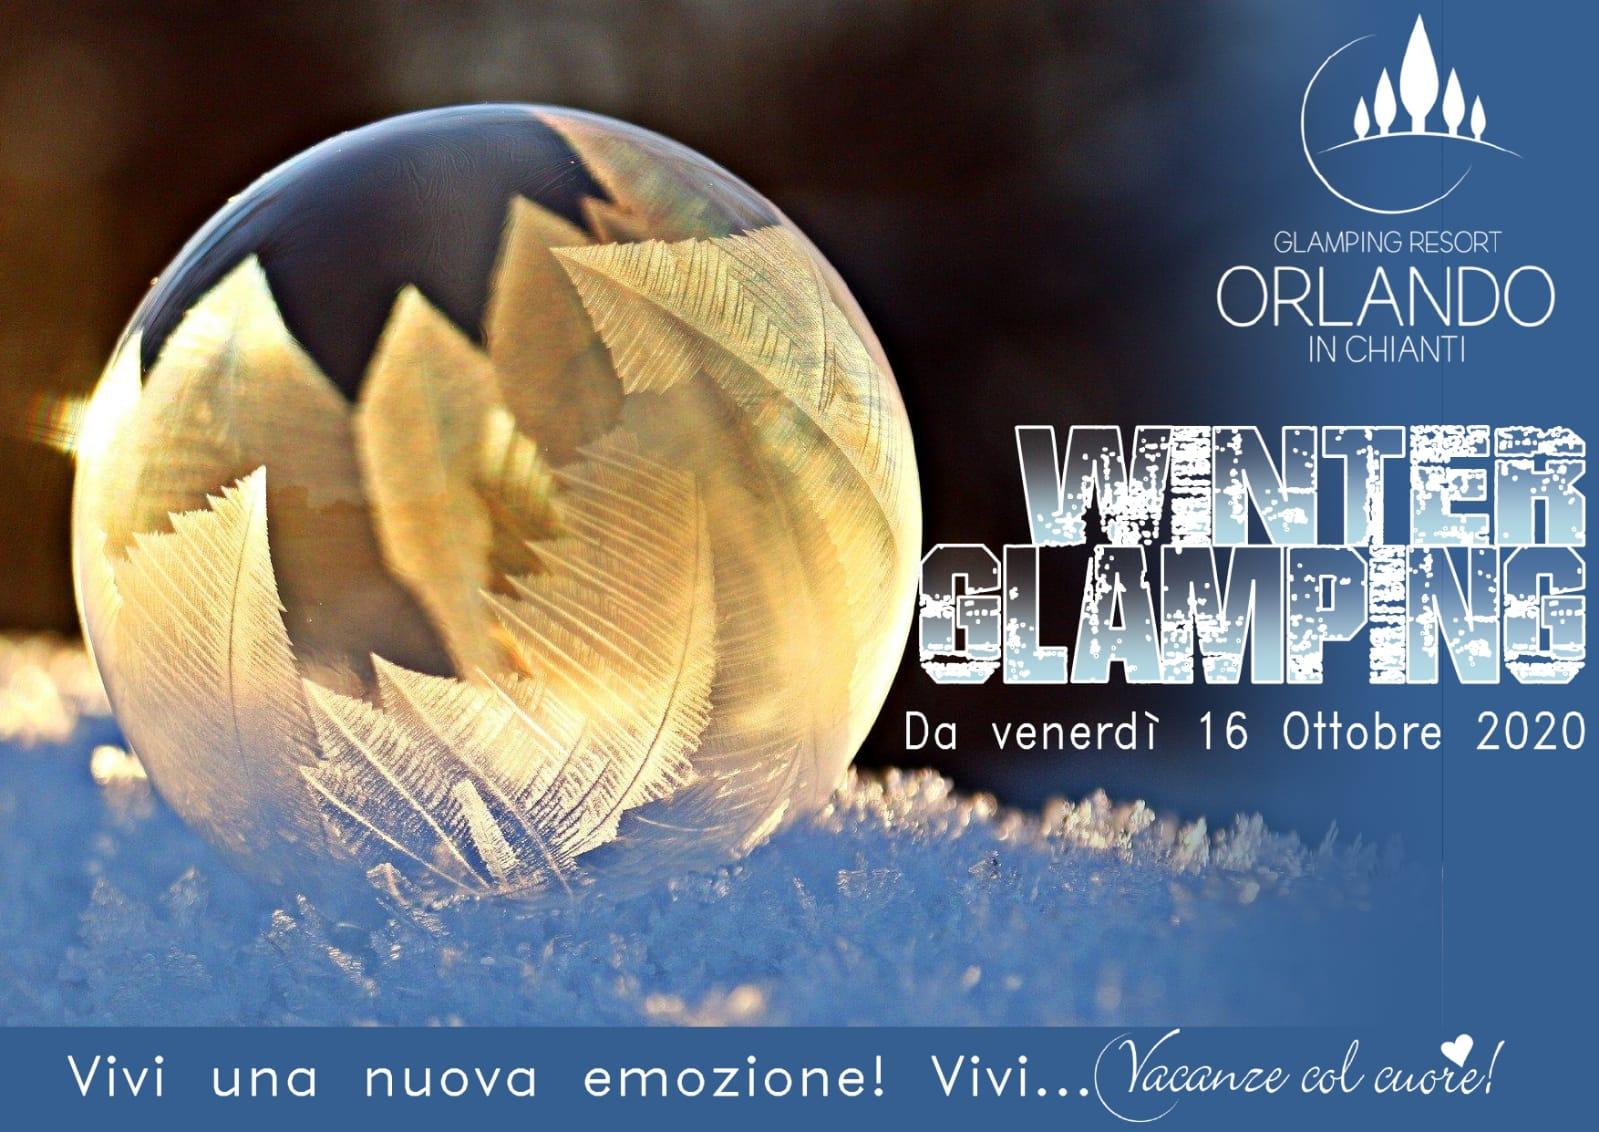 Orlando in Chianti Winter Glamping    Opening soon